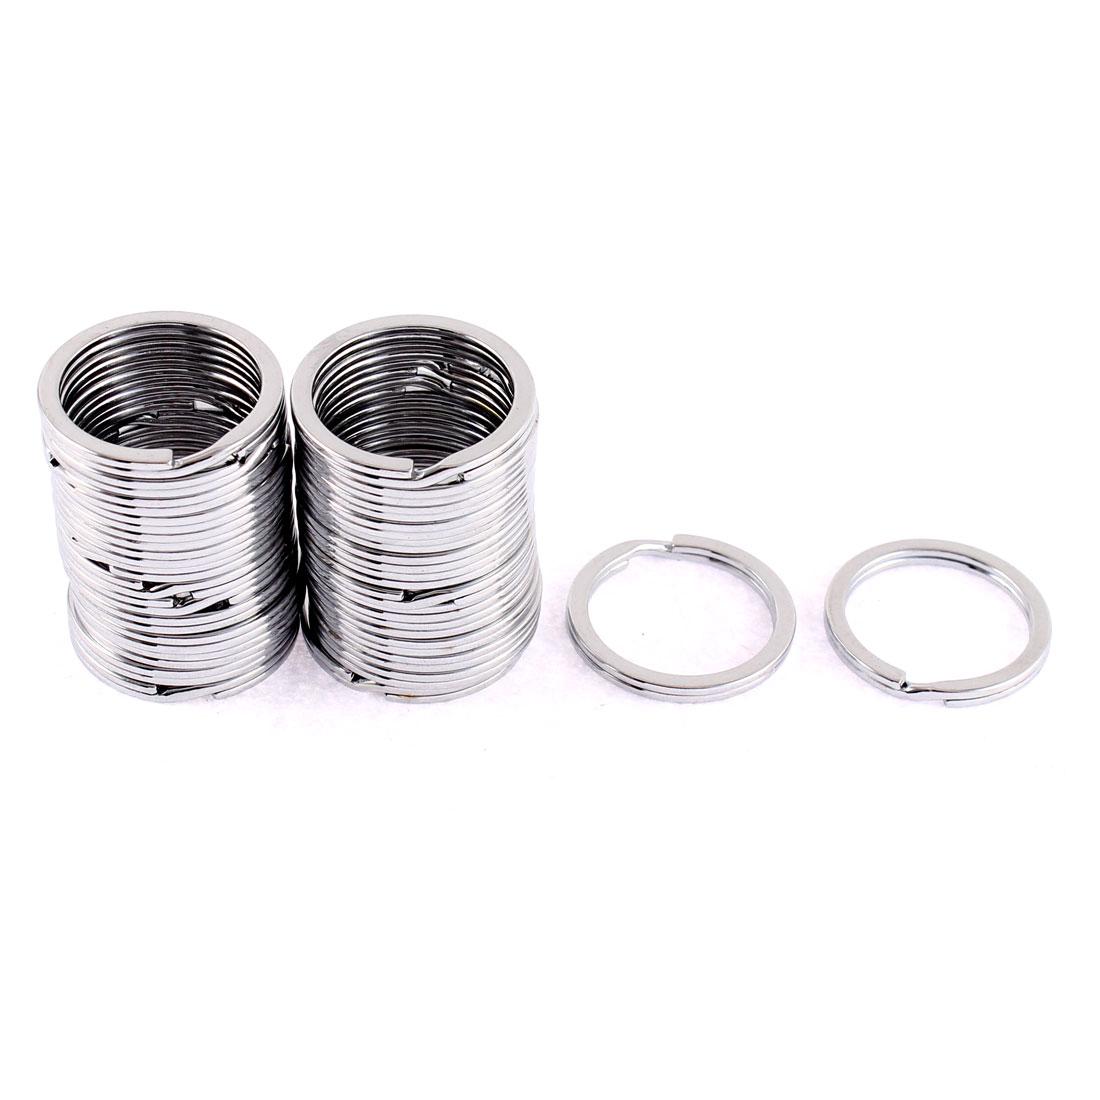 30 Pcs Metal Round Double Loop Split Key Rings 25mm Outside Dia